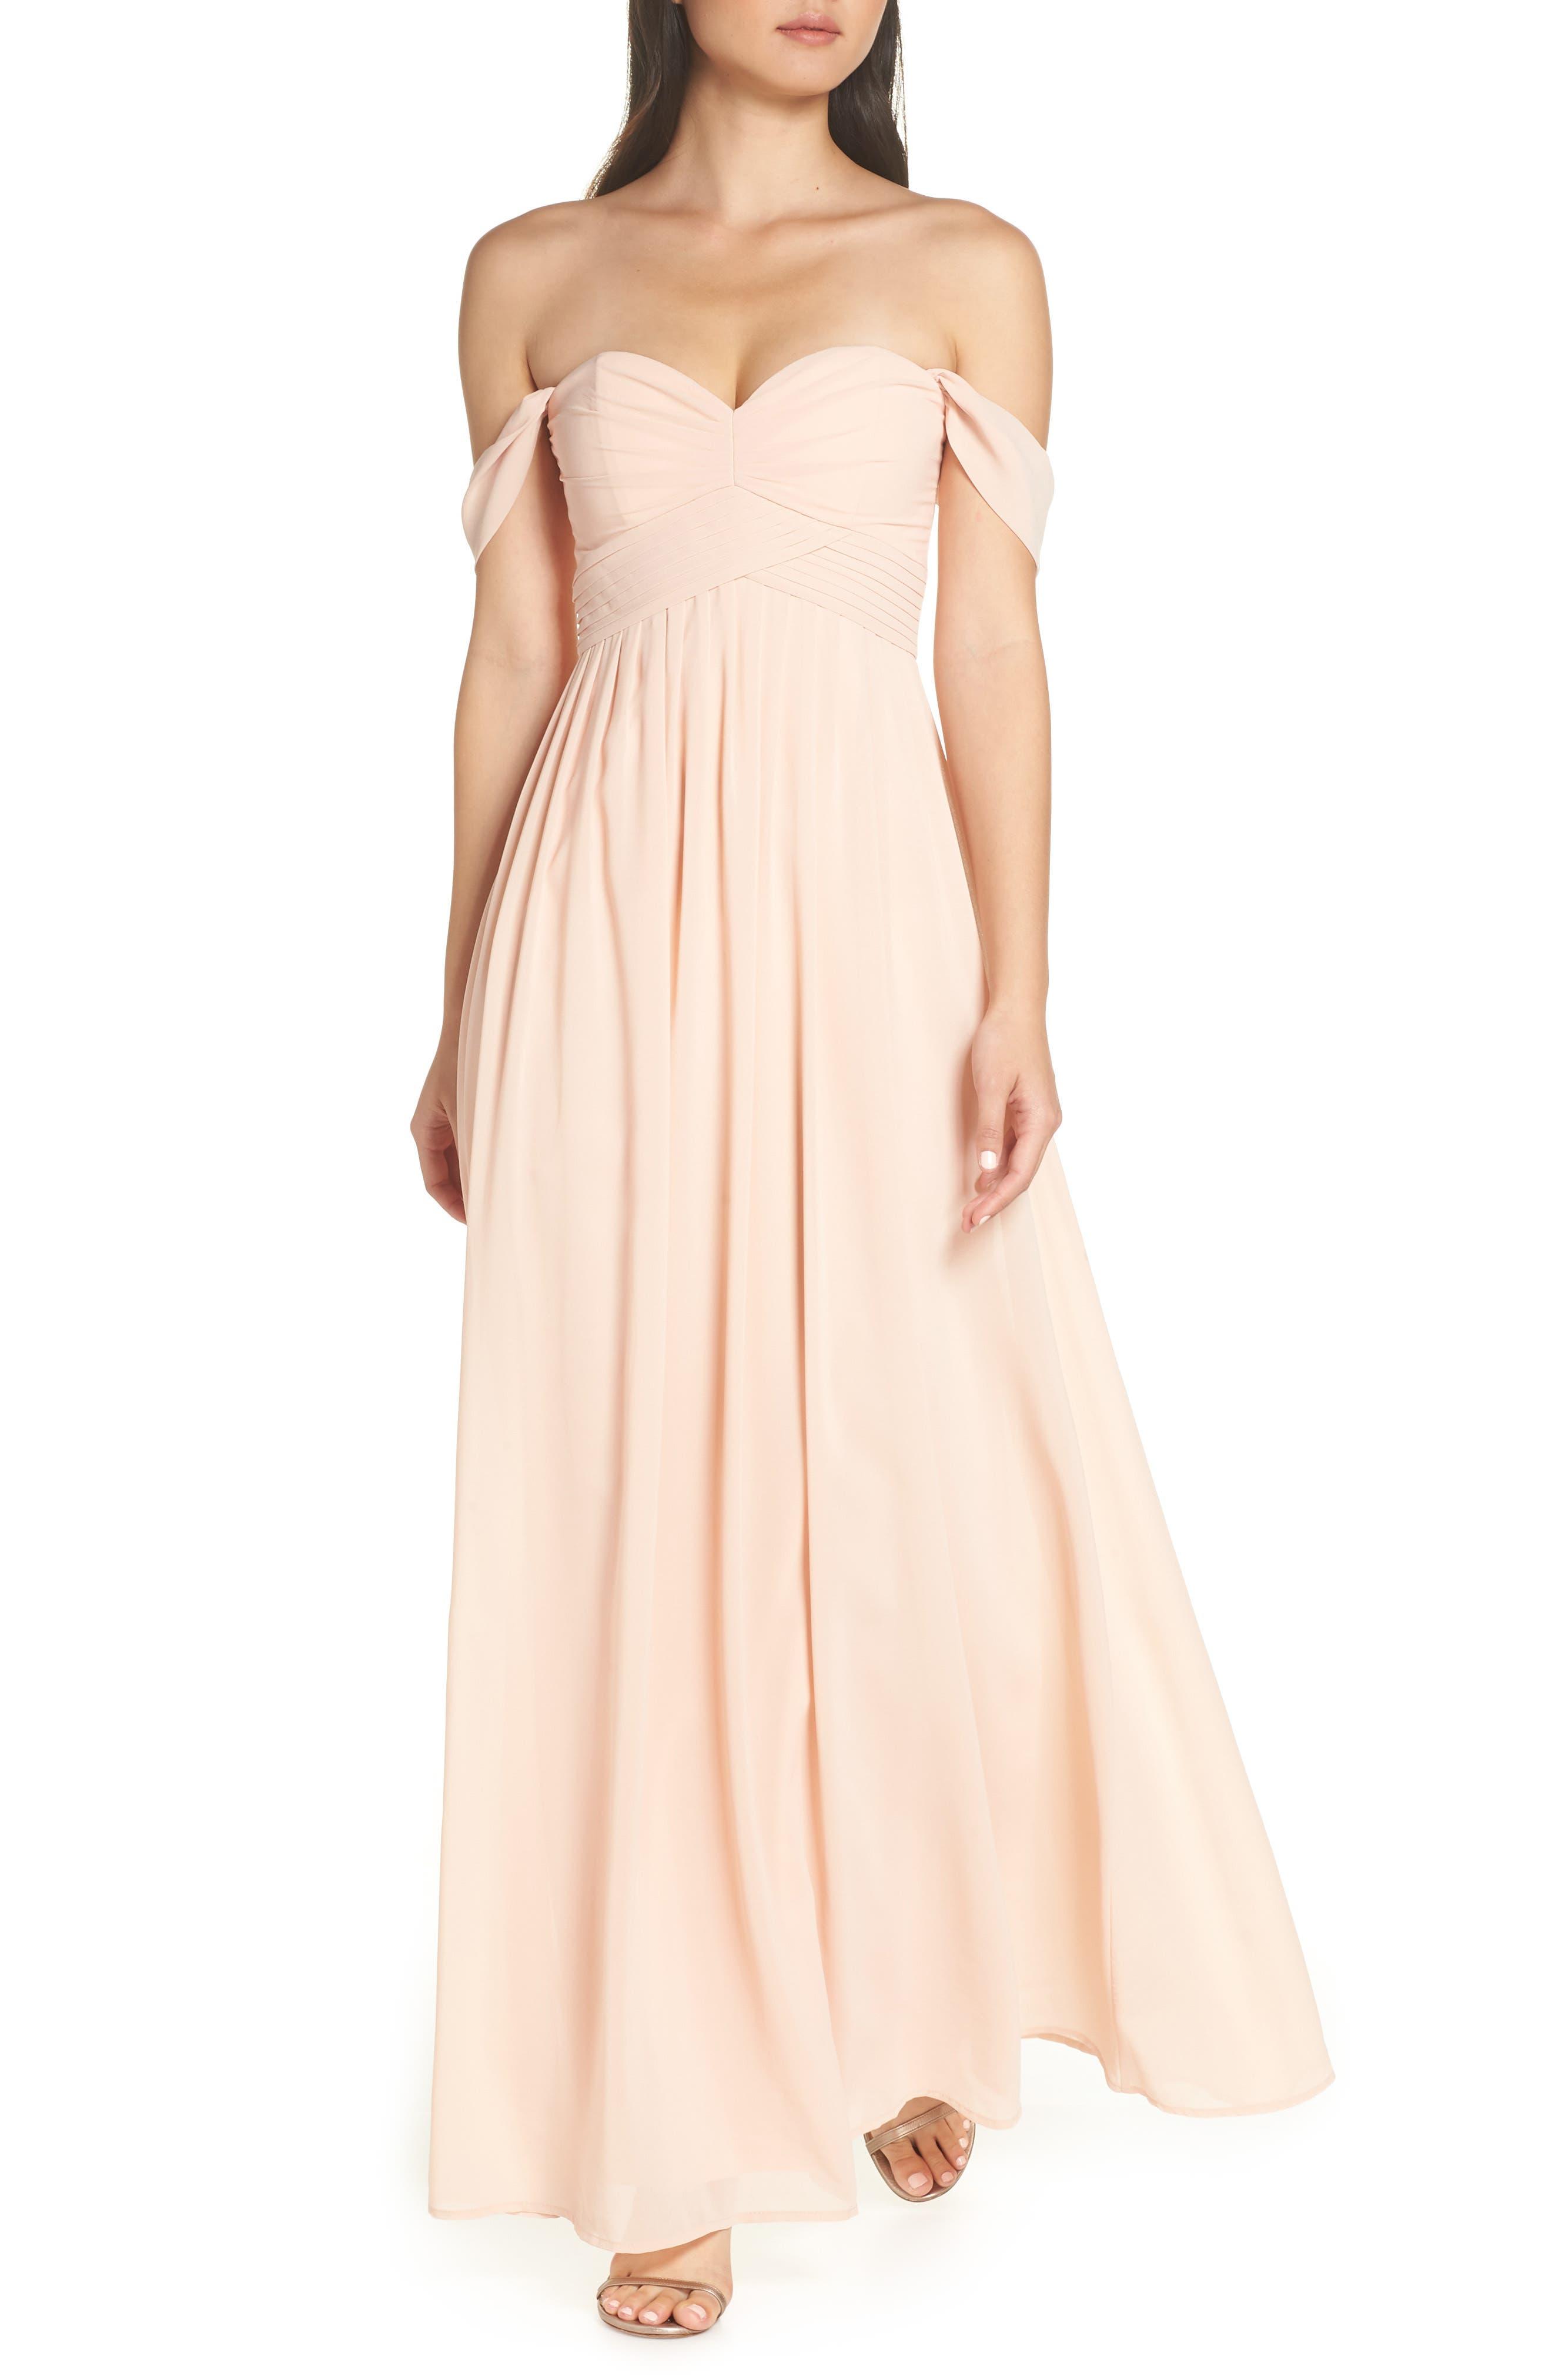 Lulus Convertible Neckline Chiffon Gown, Pink